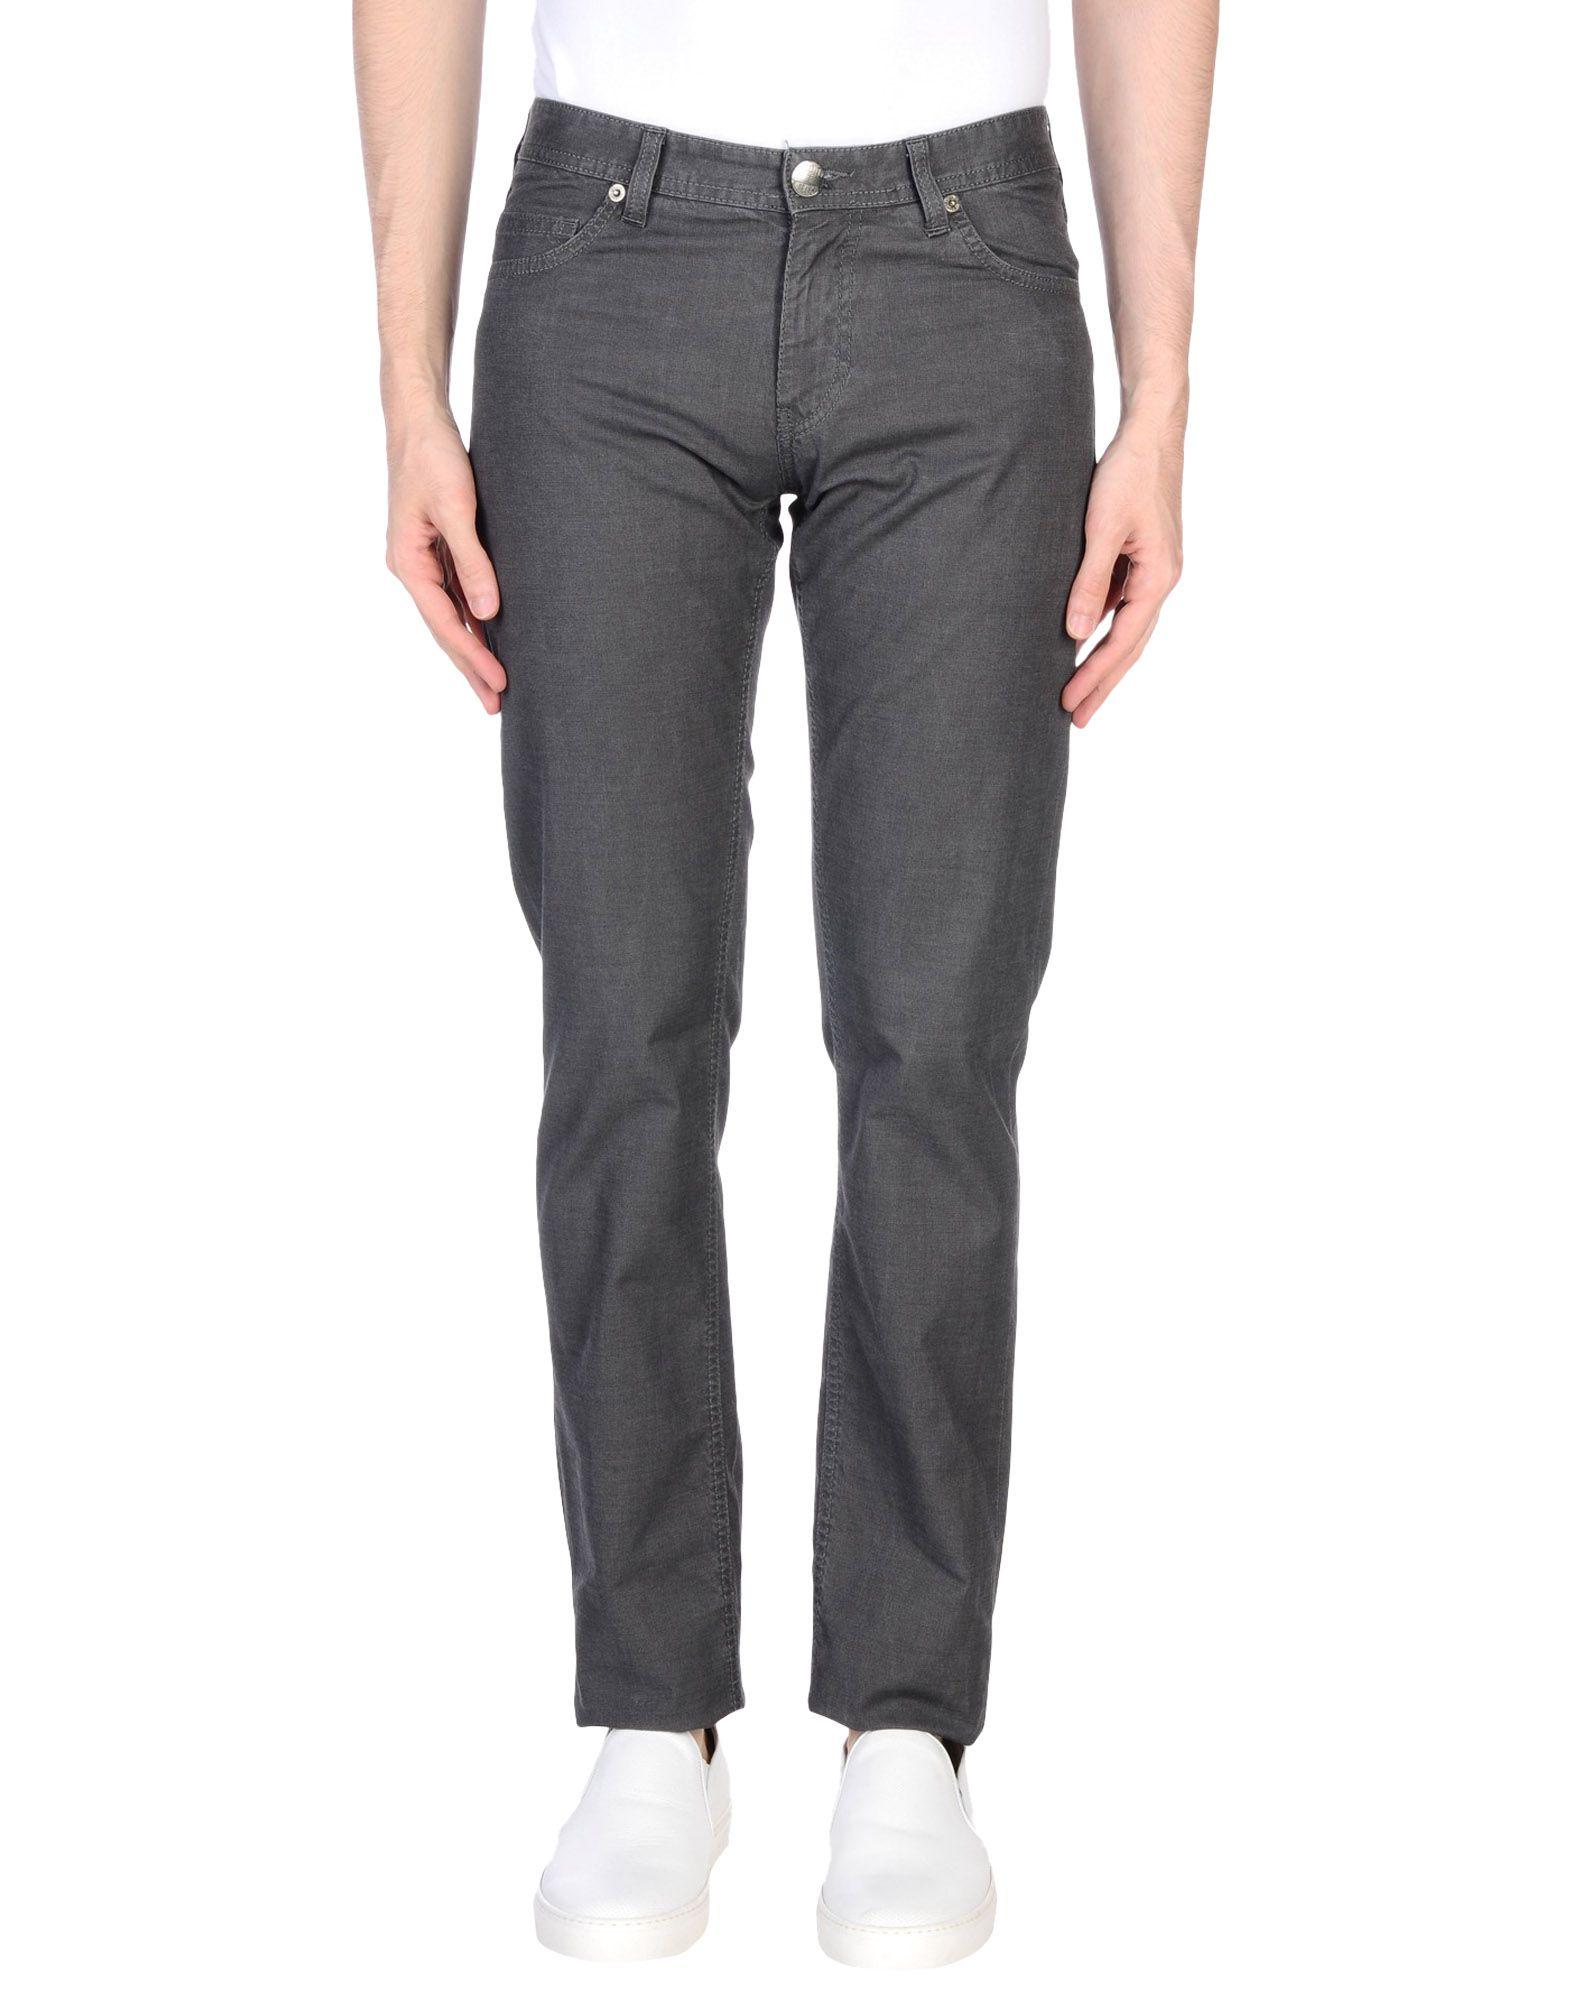 5 Tasche Jeans Versace Jeans Tasche Uomo - 13104746SC 2e0016